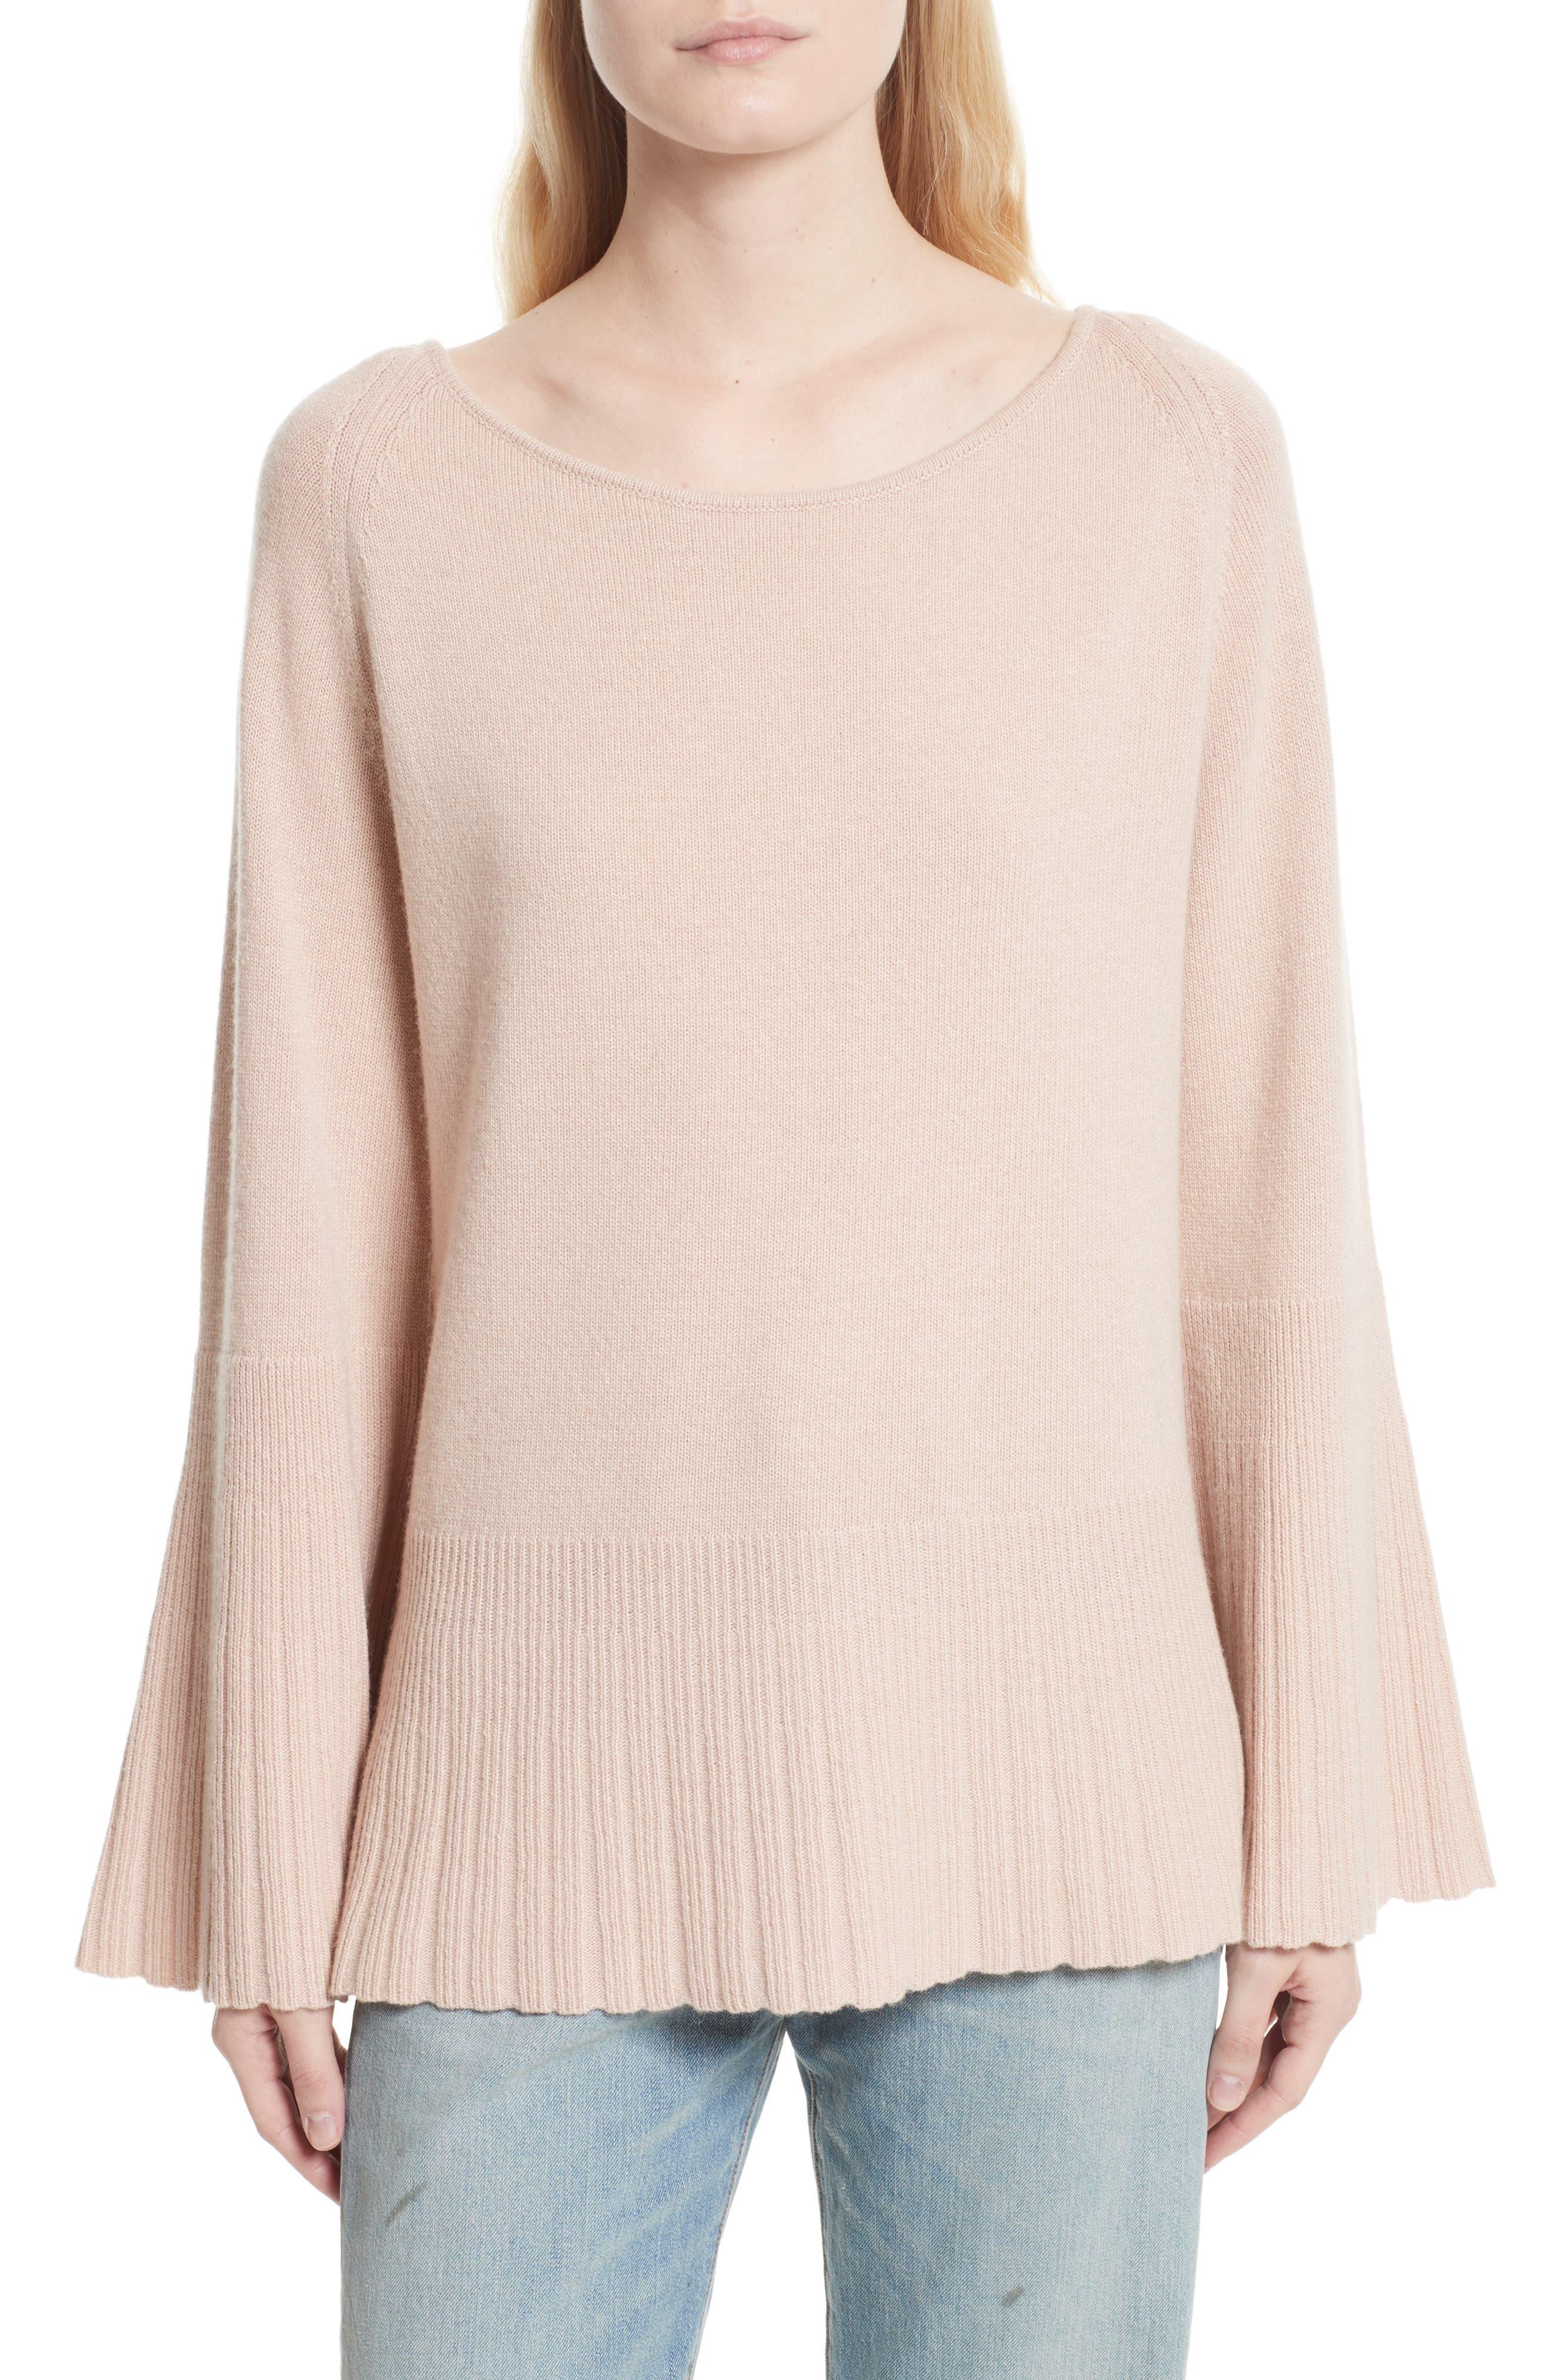 Elizabeth and James Clarette Bell Sleeve Sweater